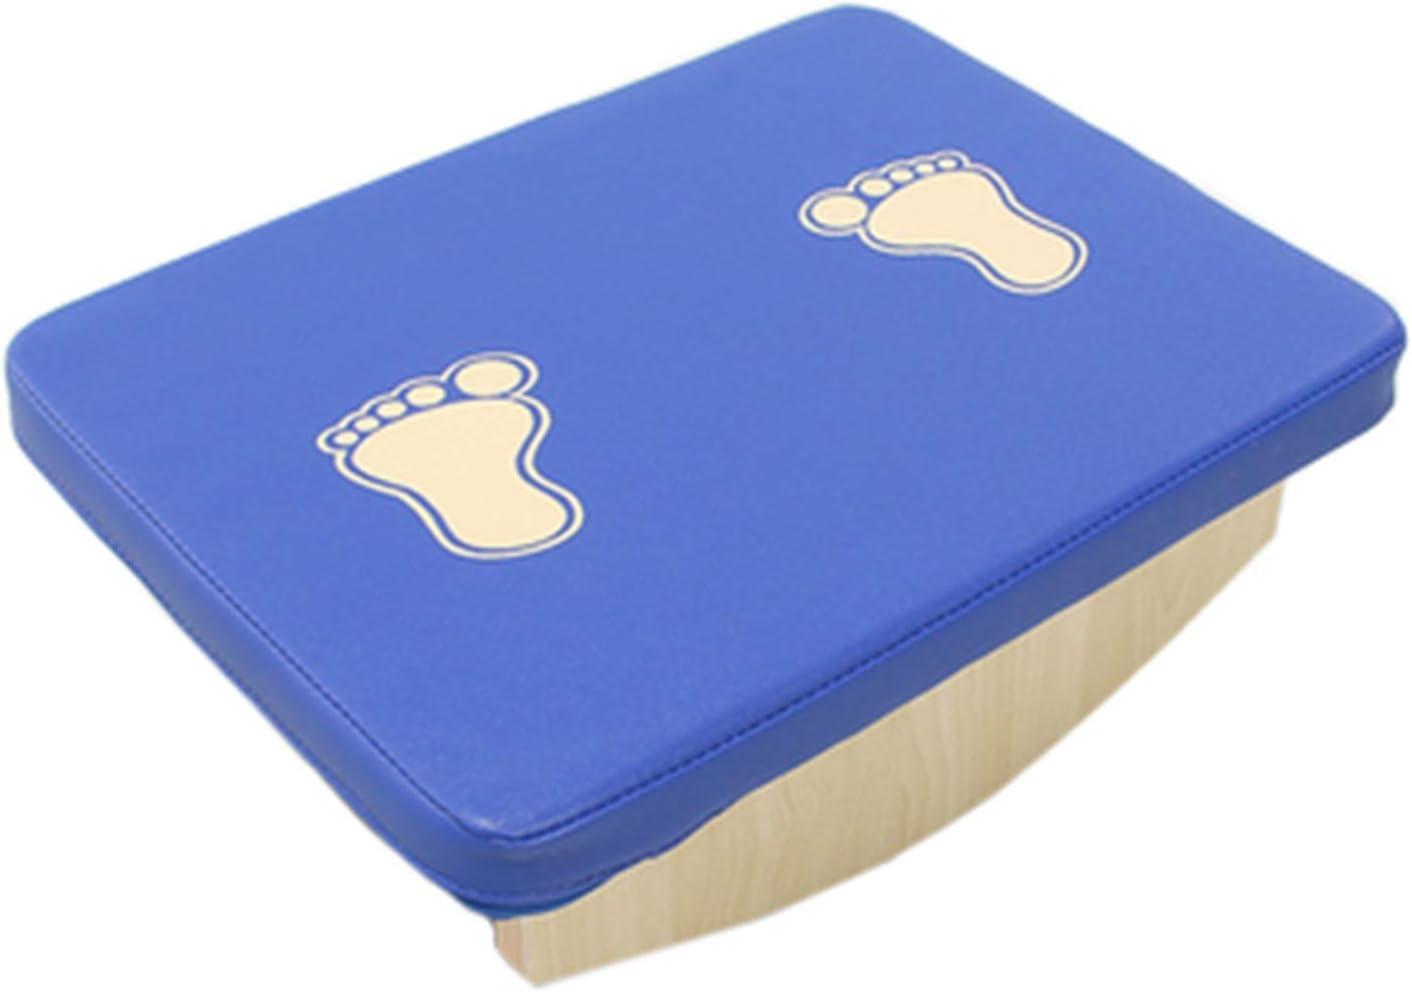 OFFicial site hujio Aoligei Balance Board Cheap Sensory Kids Wooden